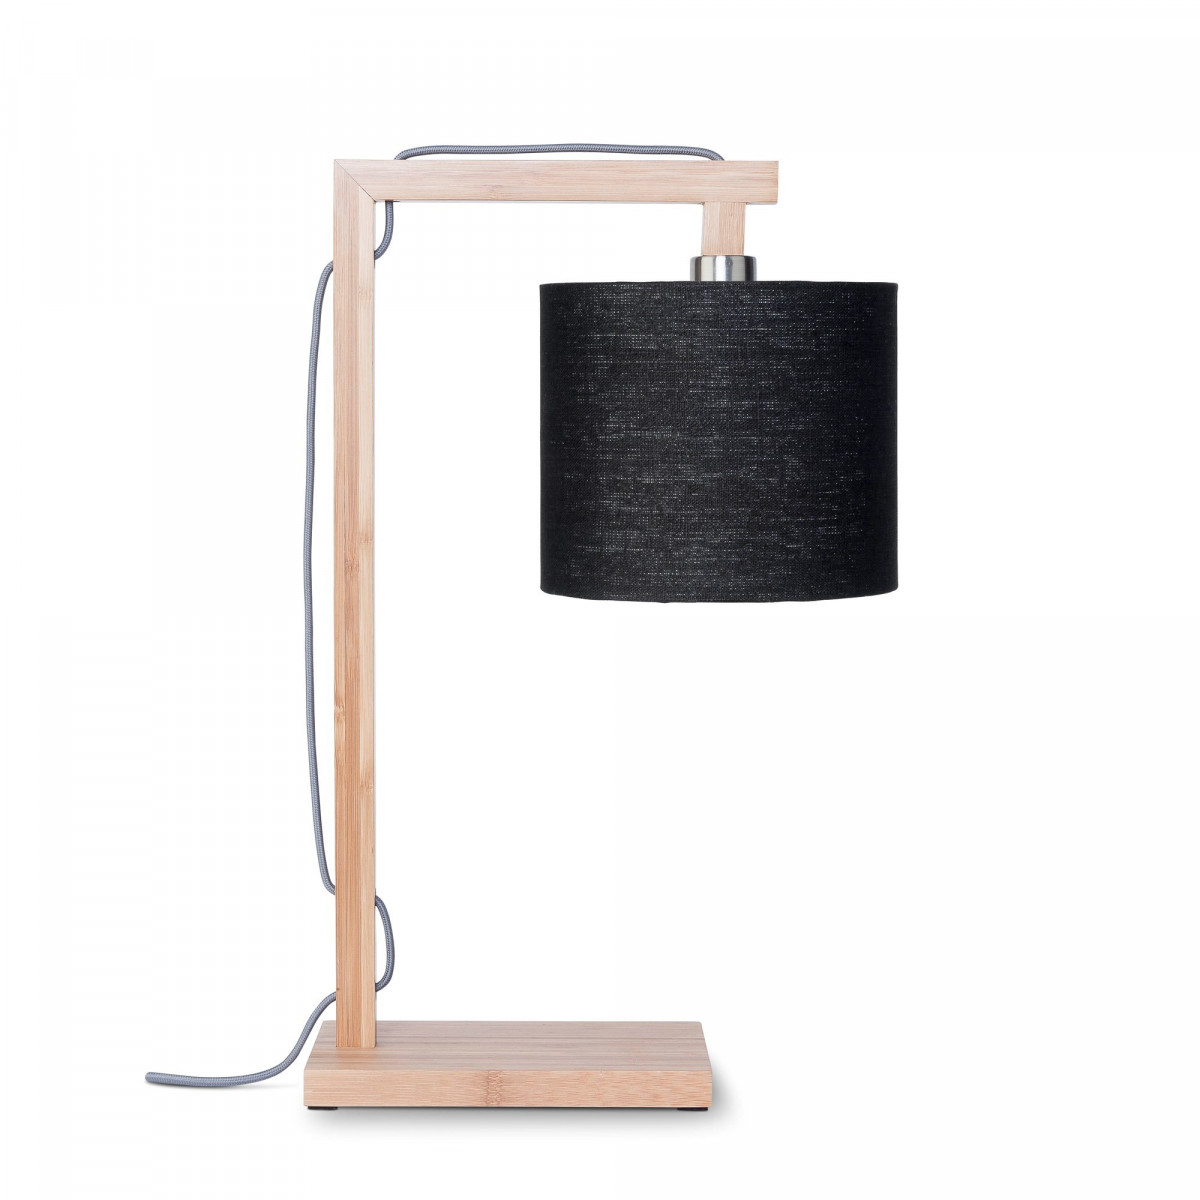 Lampe de table Himalaya en lin et bambou Noirw